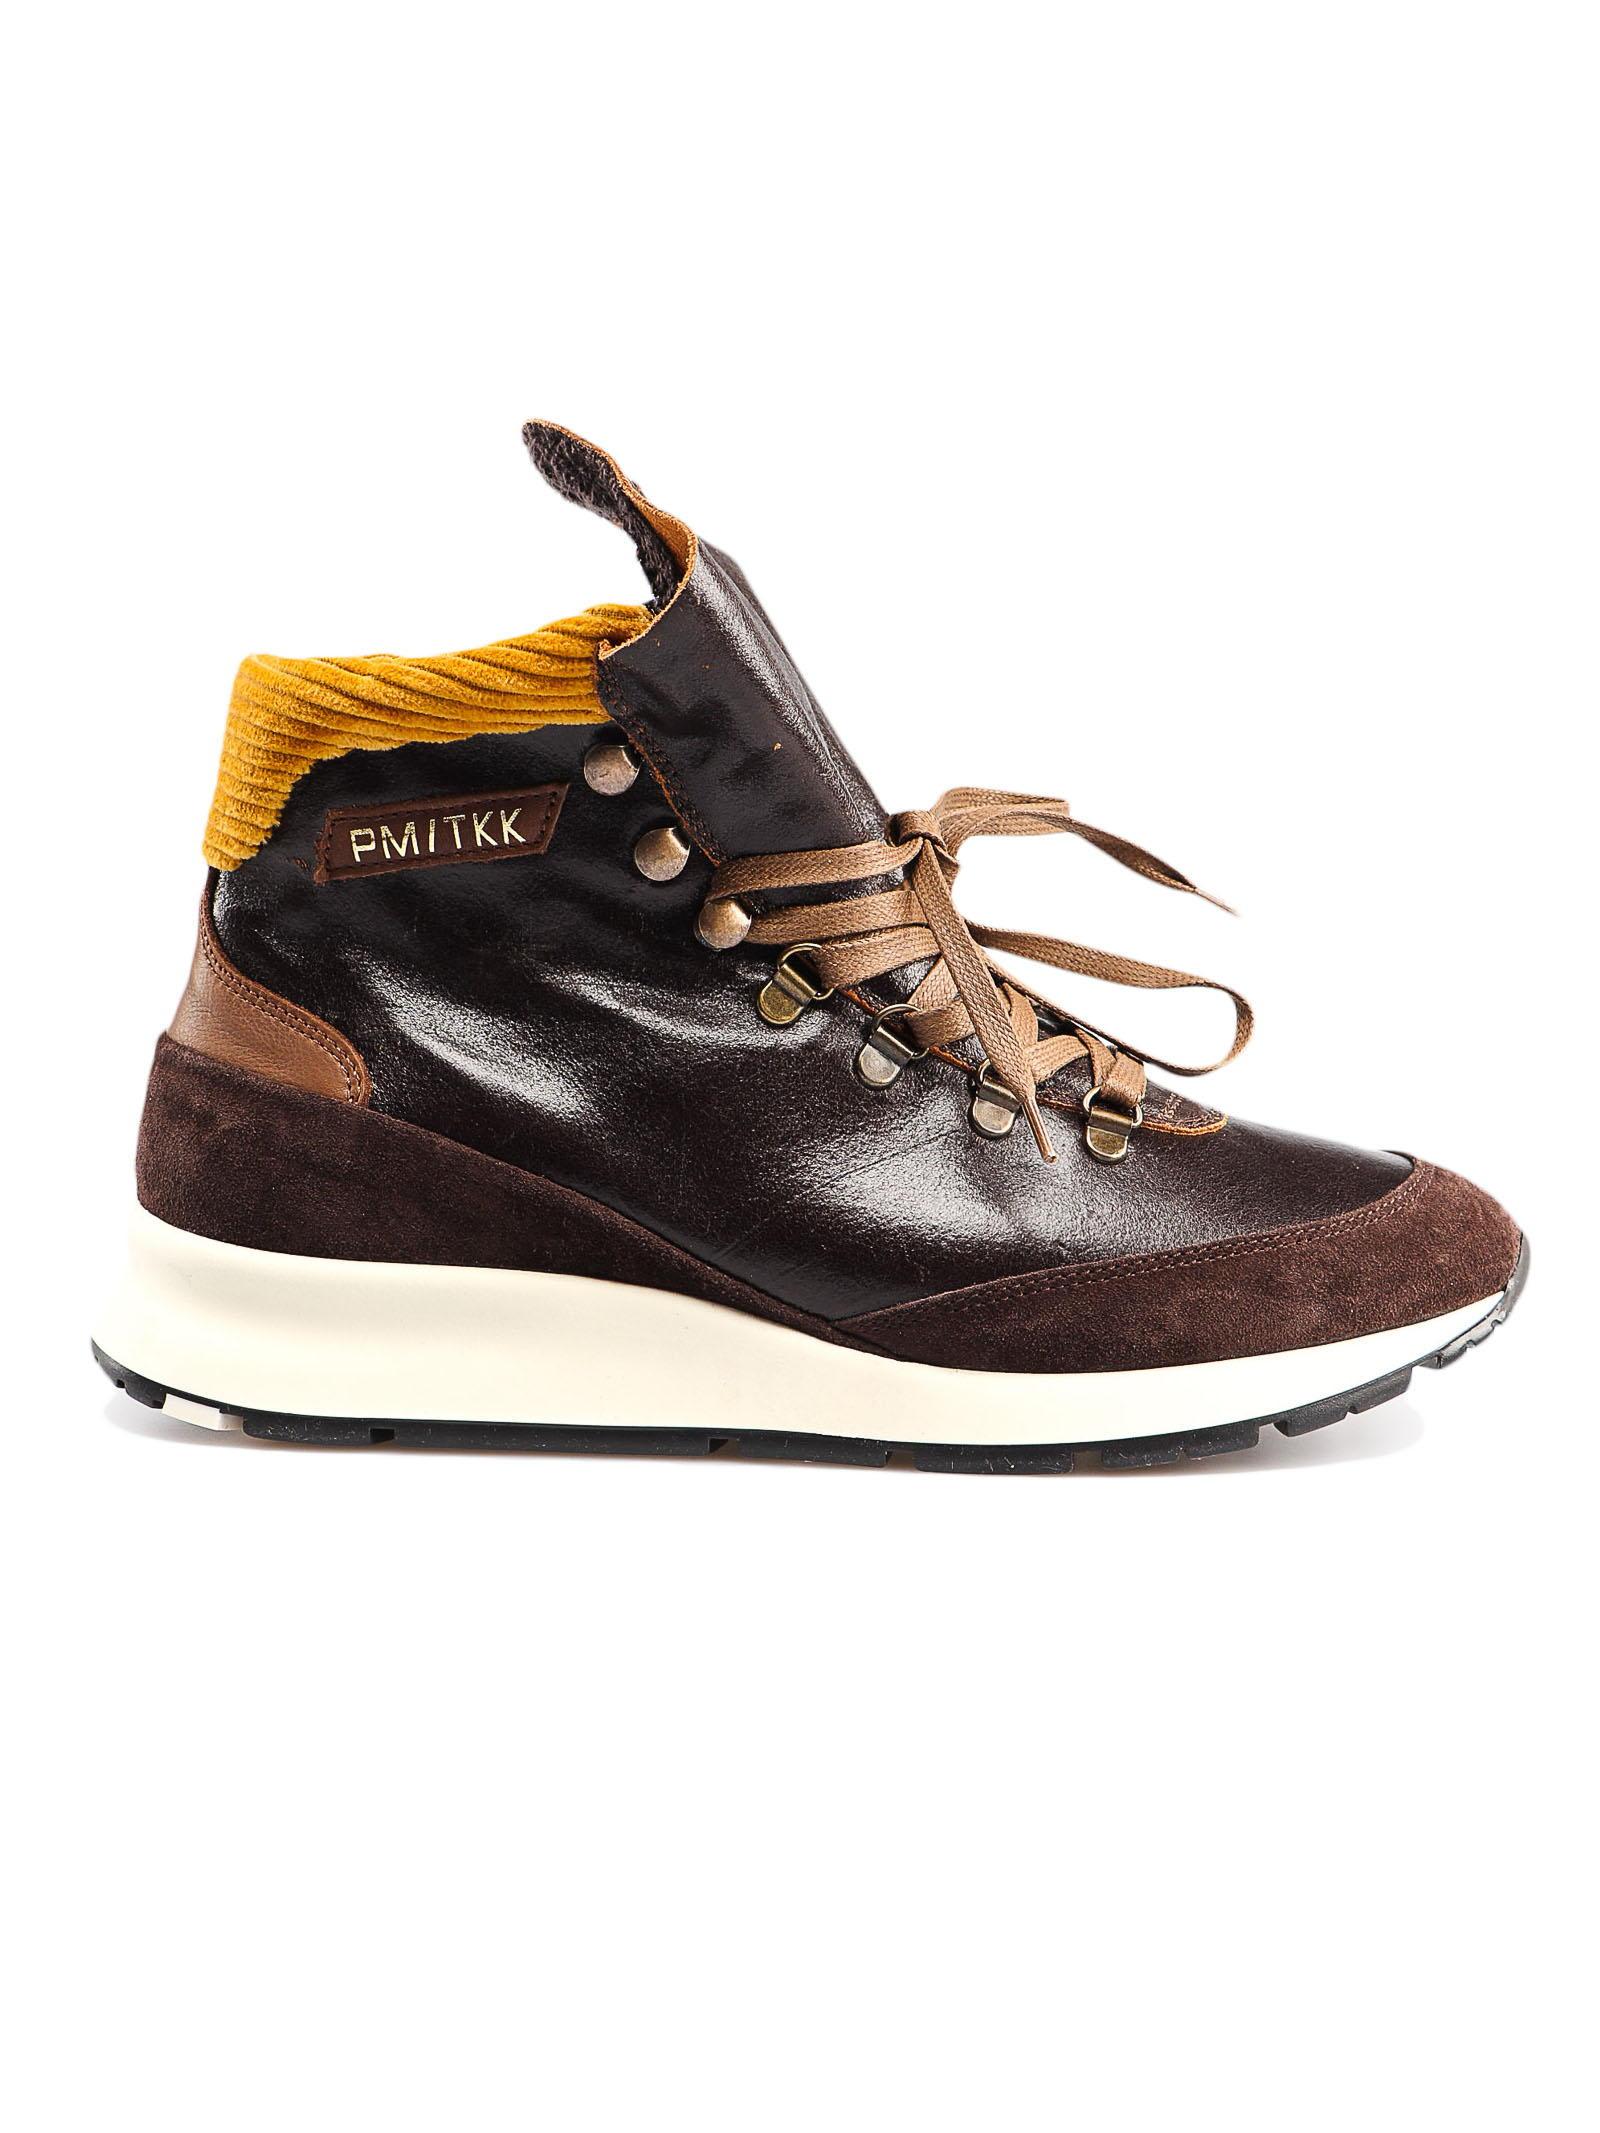 Philippe Model Tkk Boot